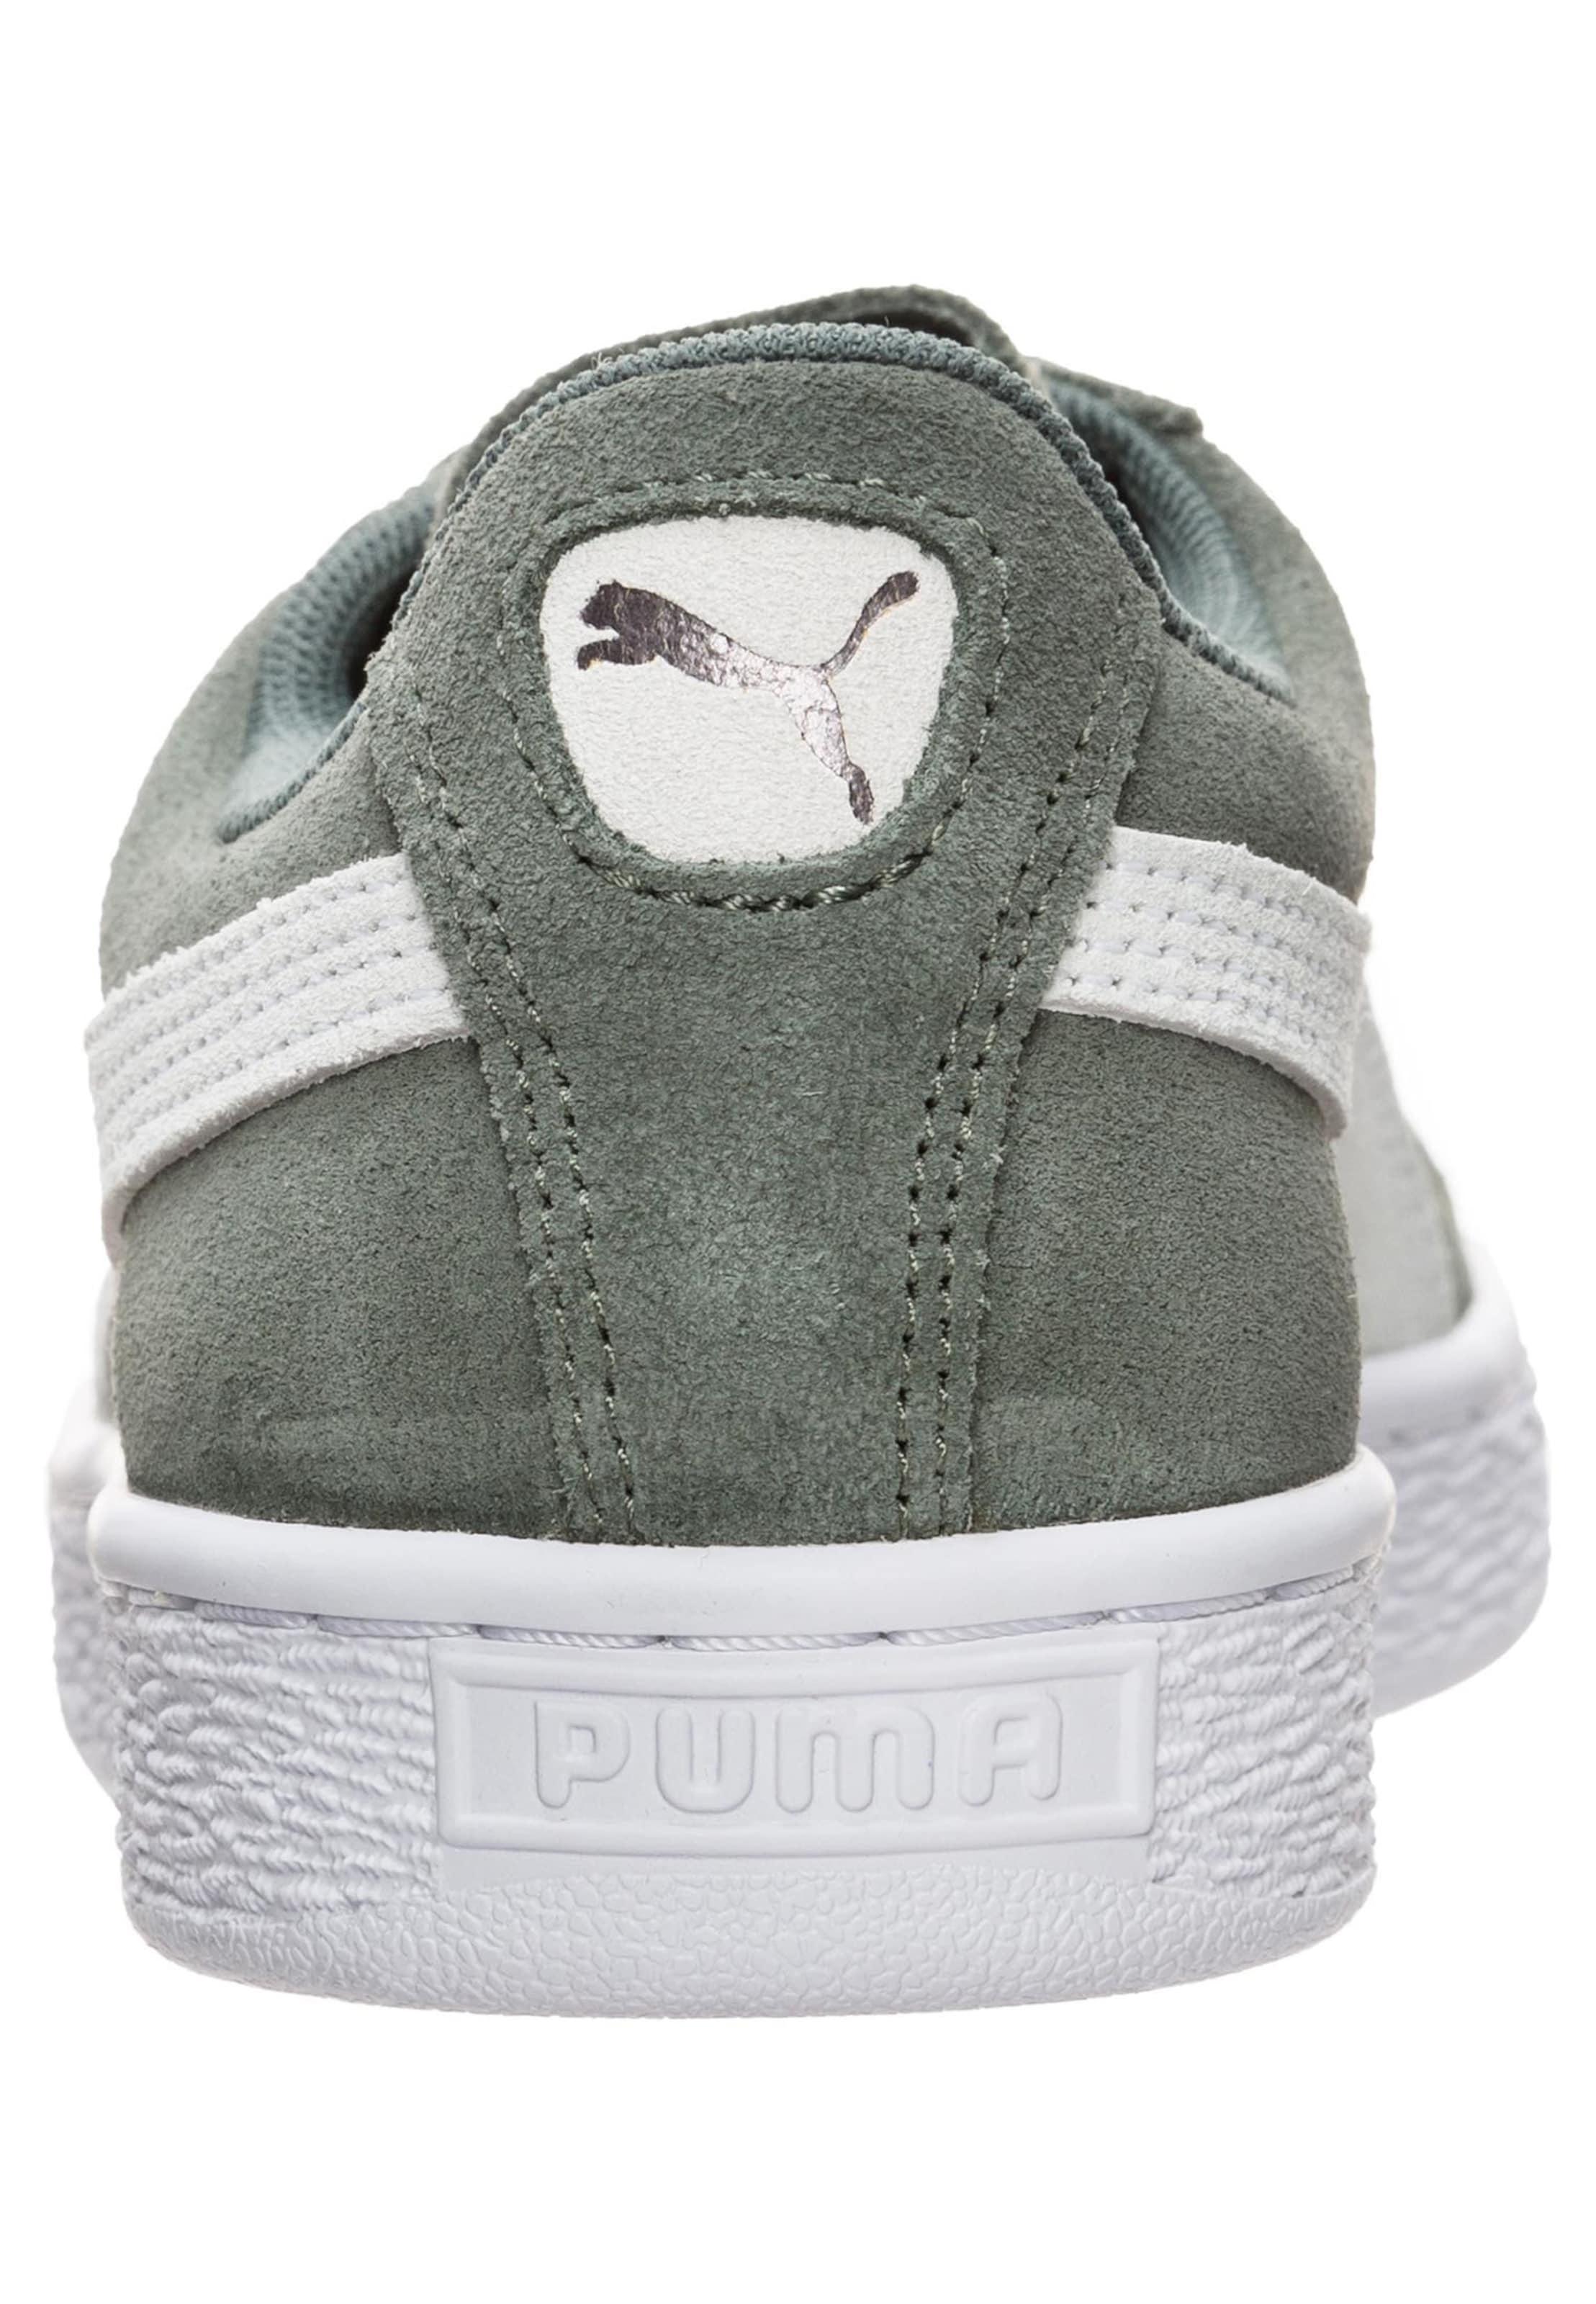 Classic' Sneaker 'suede In Naturweiß KhakiWeiß Puma 8wXkn0OP